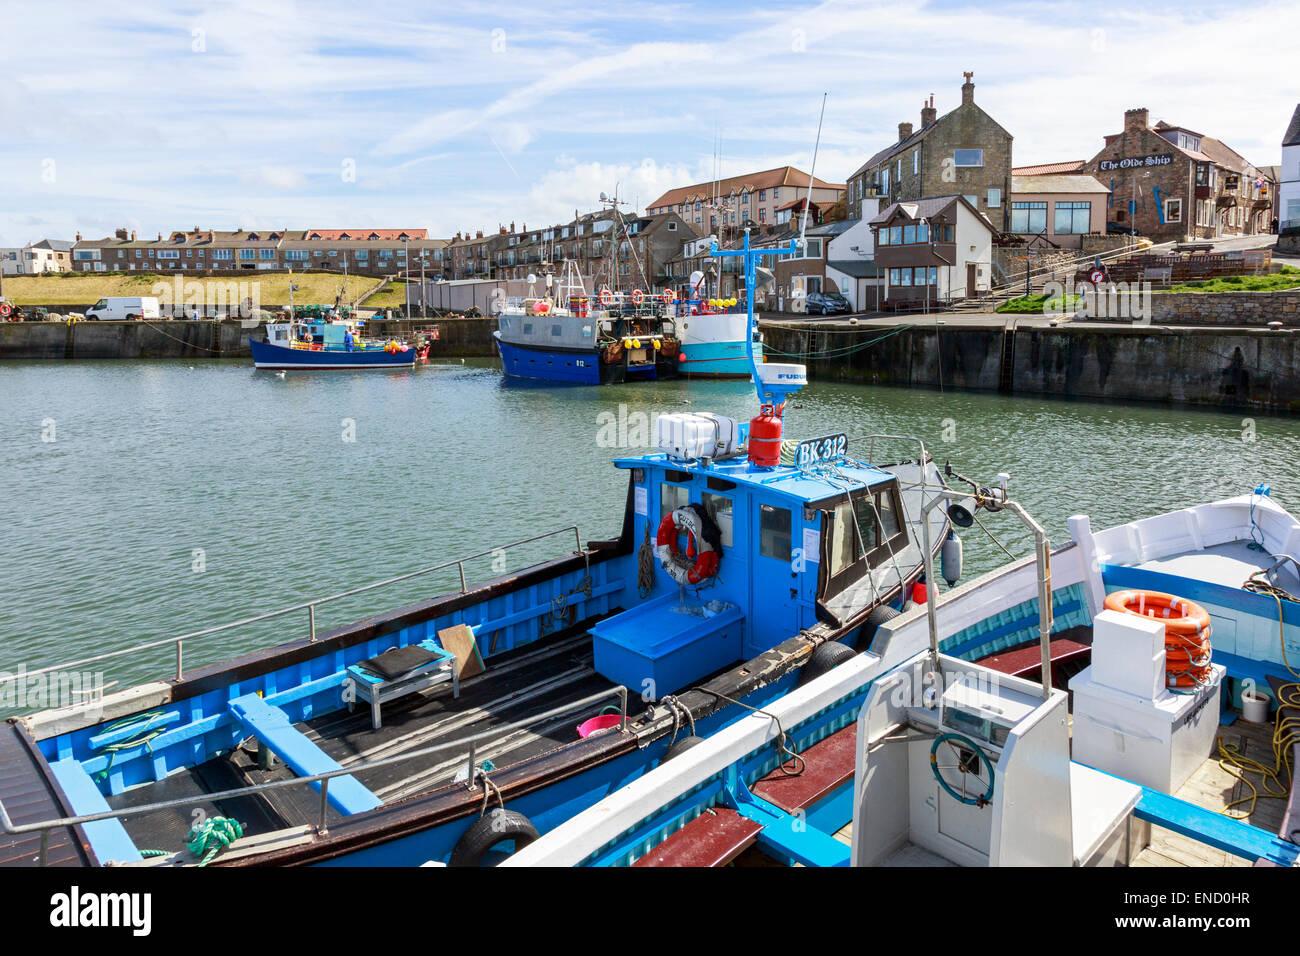 Seahouses harbour, Northumberland, England, UK - Stock Image